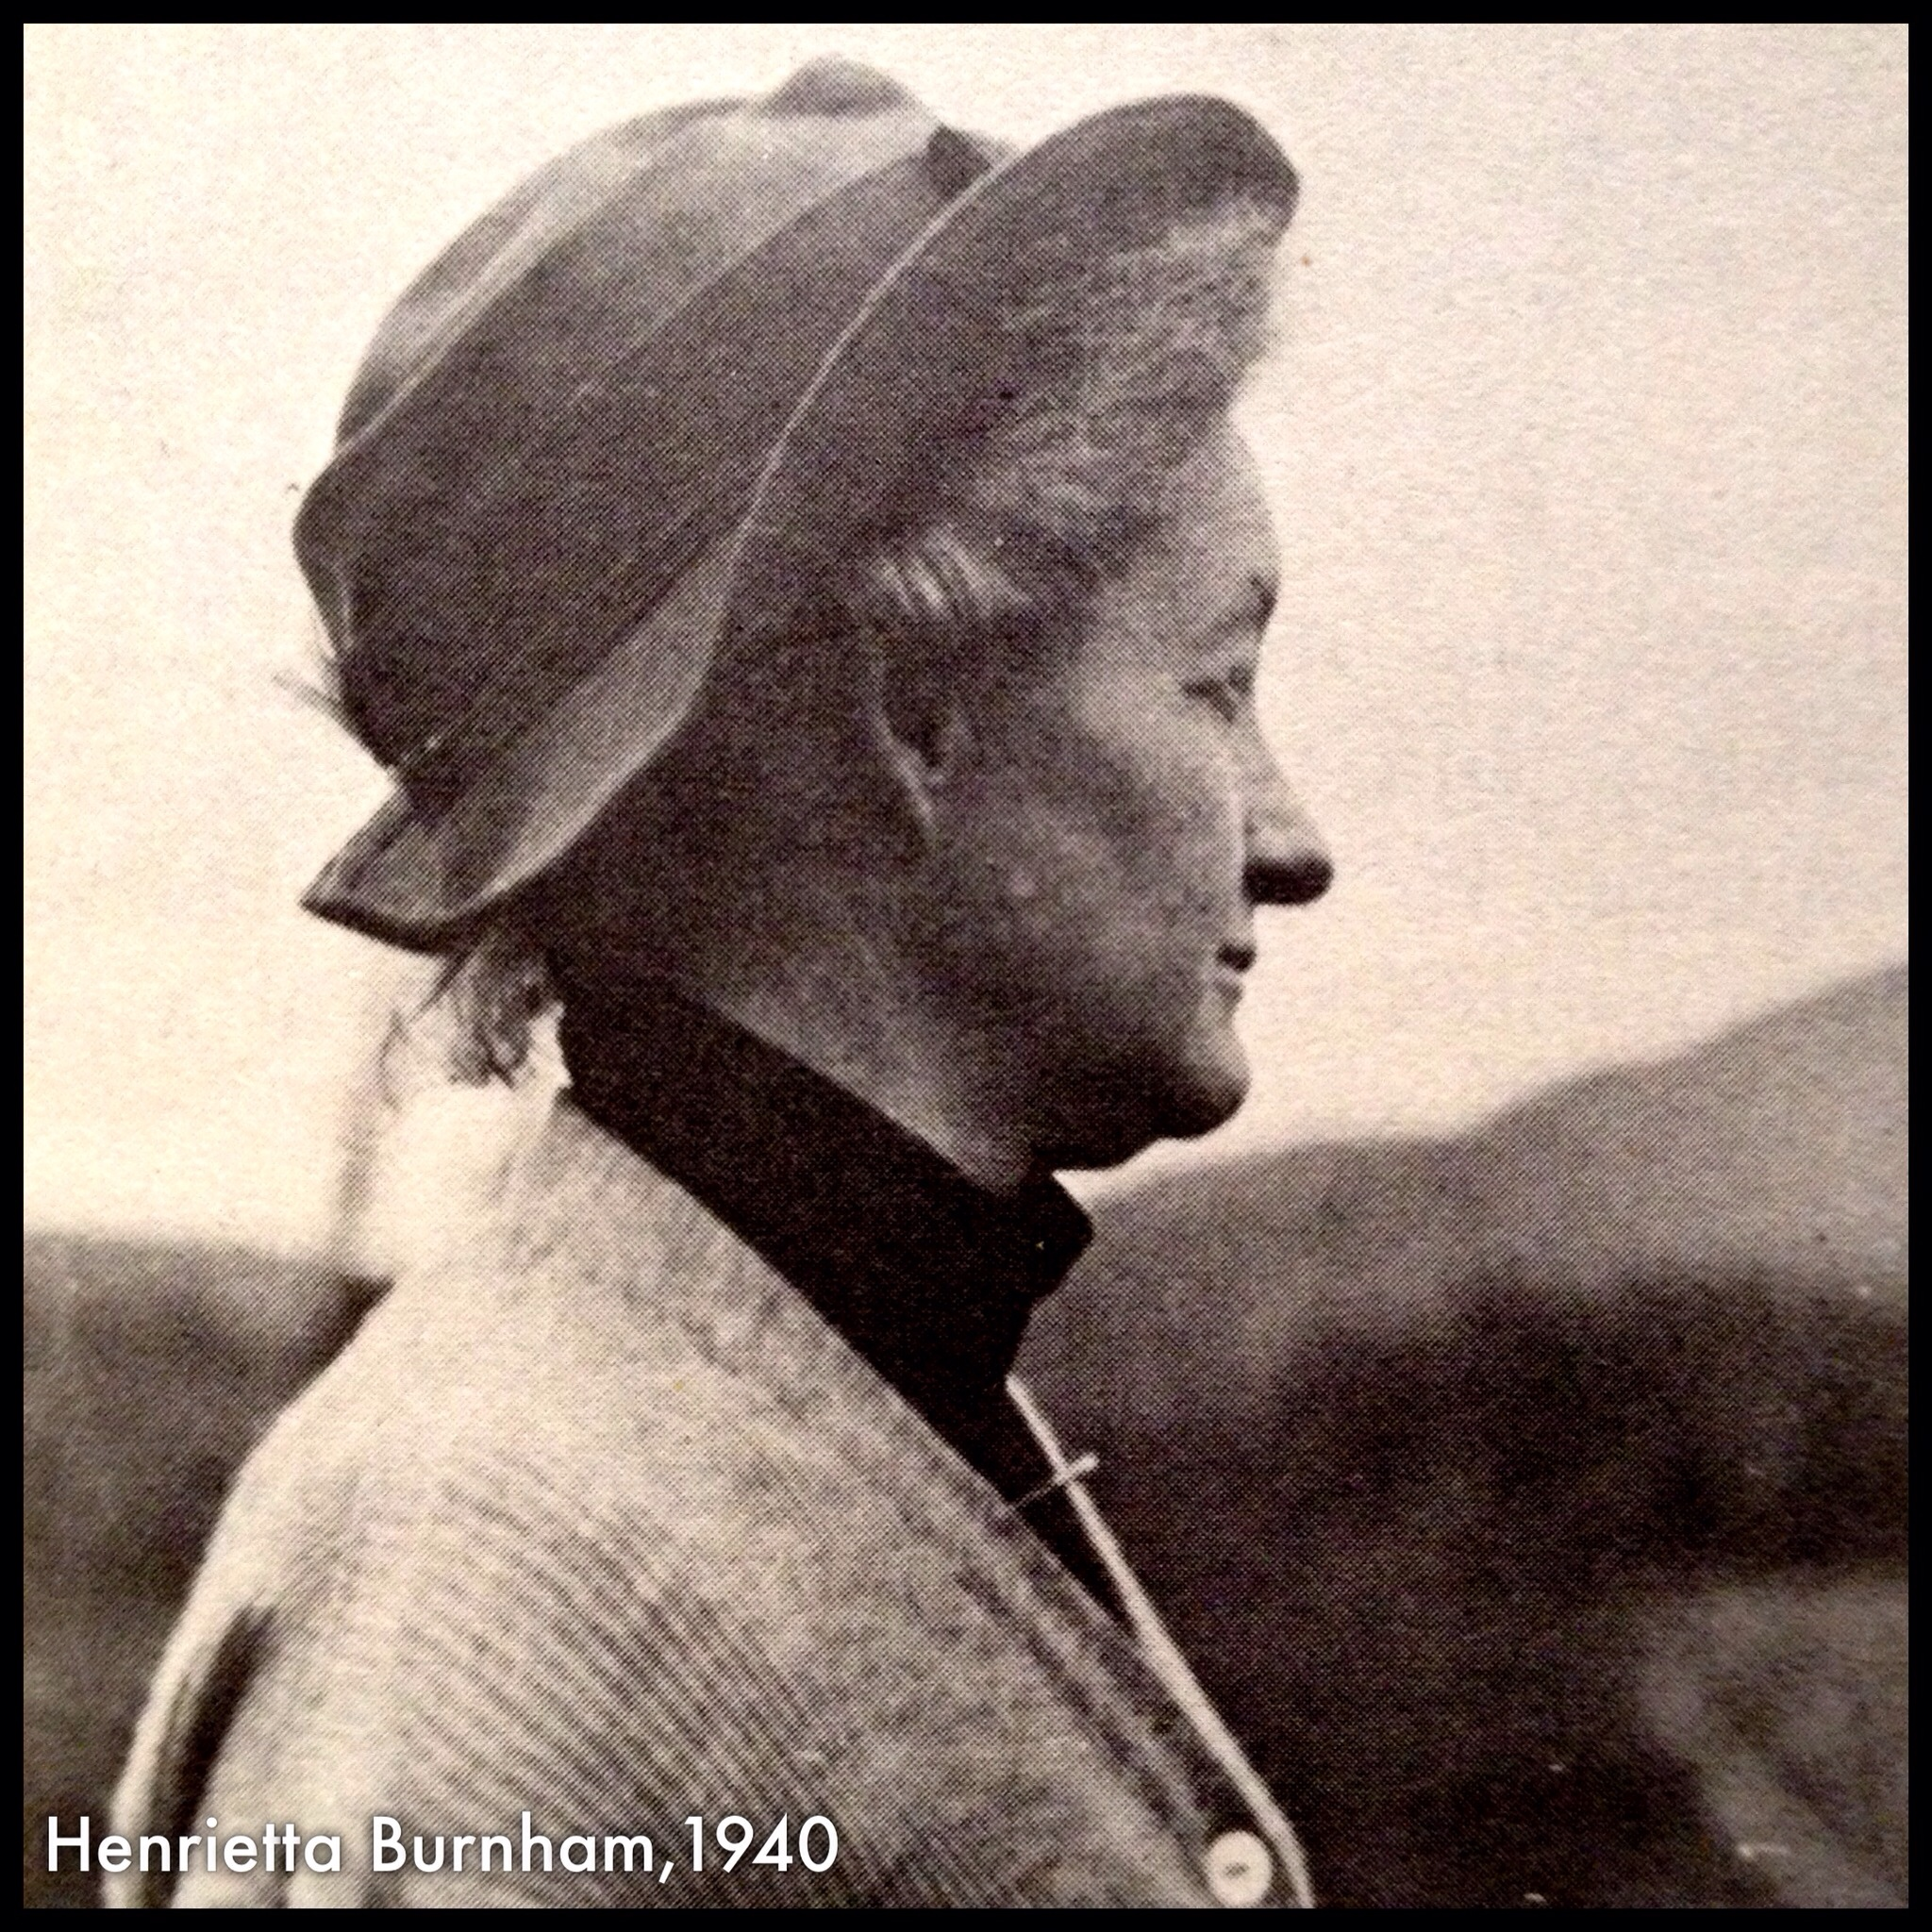 Henrietta Burnham, 1940